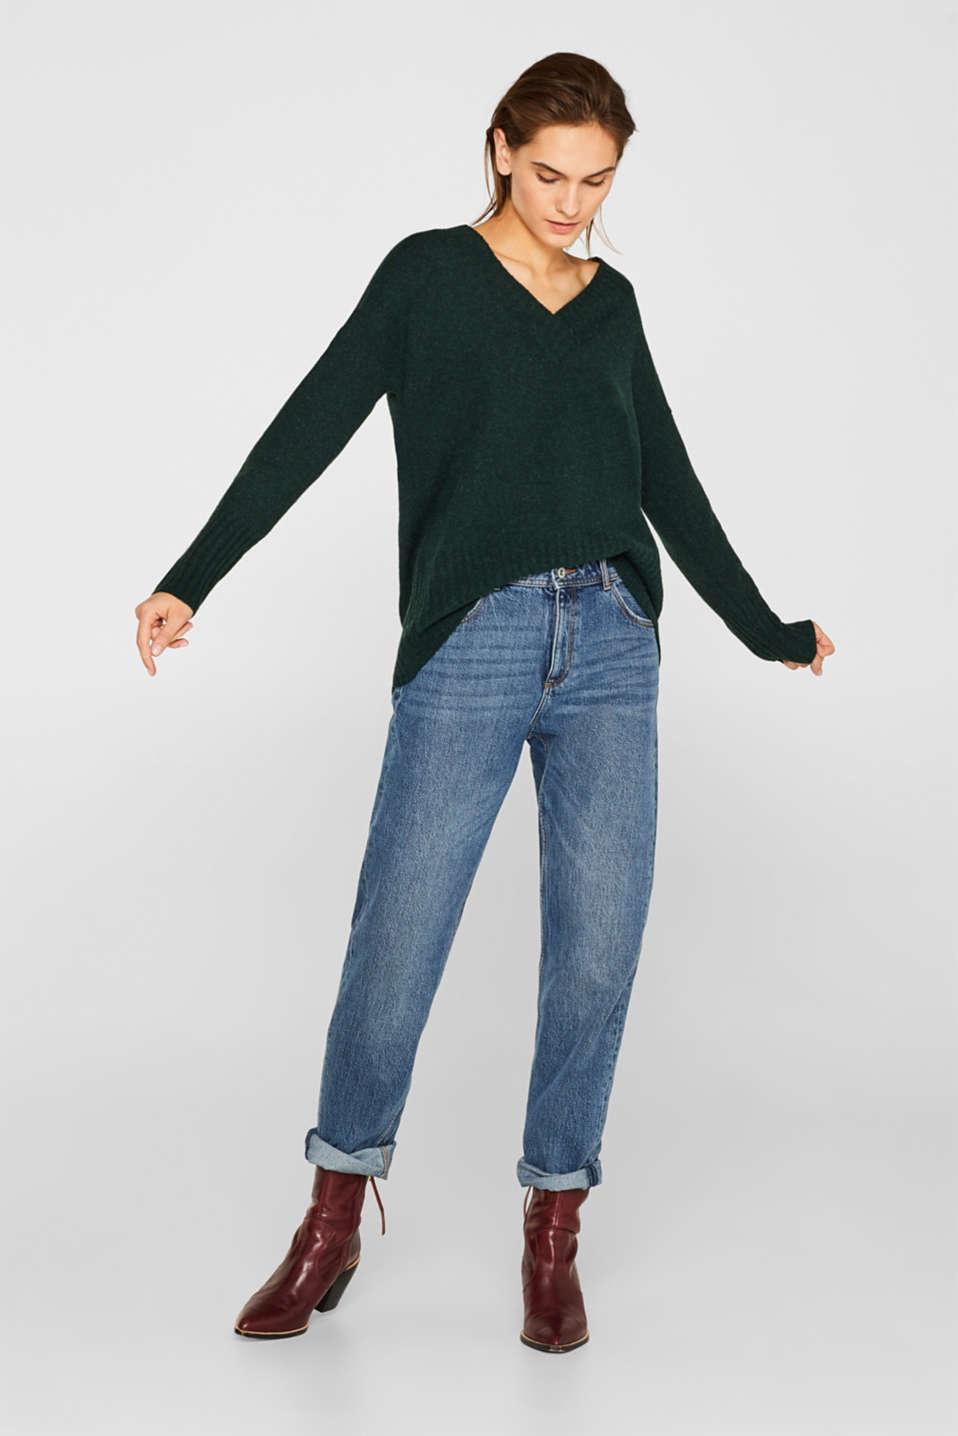 Sweaters, DARK TEAL GREEN 5, detail image number 1